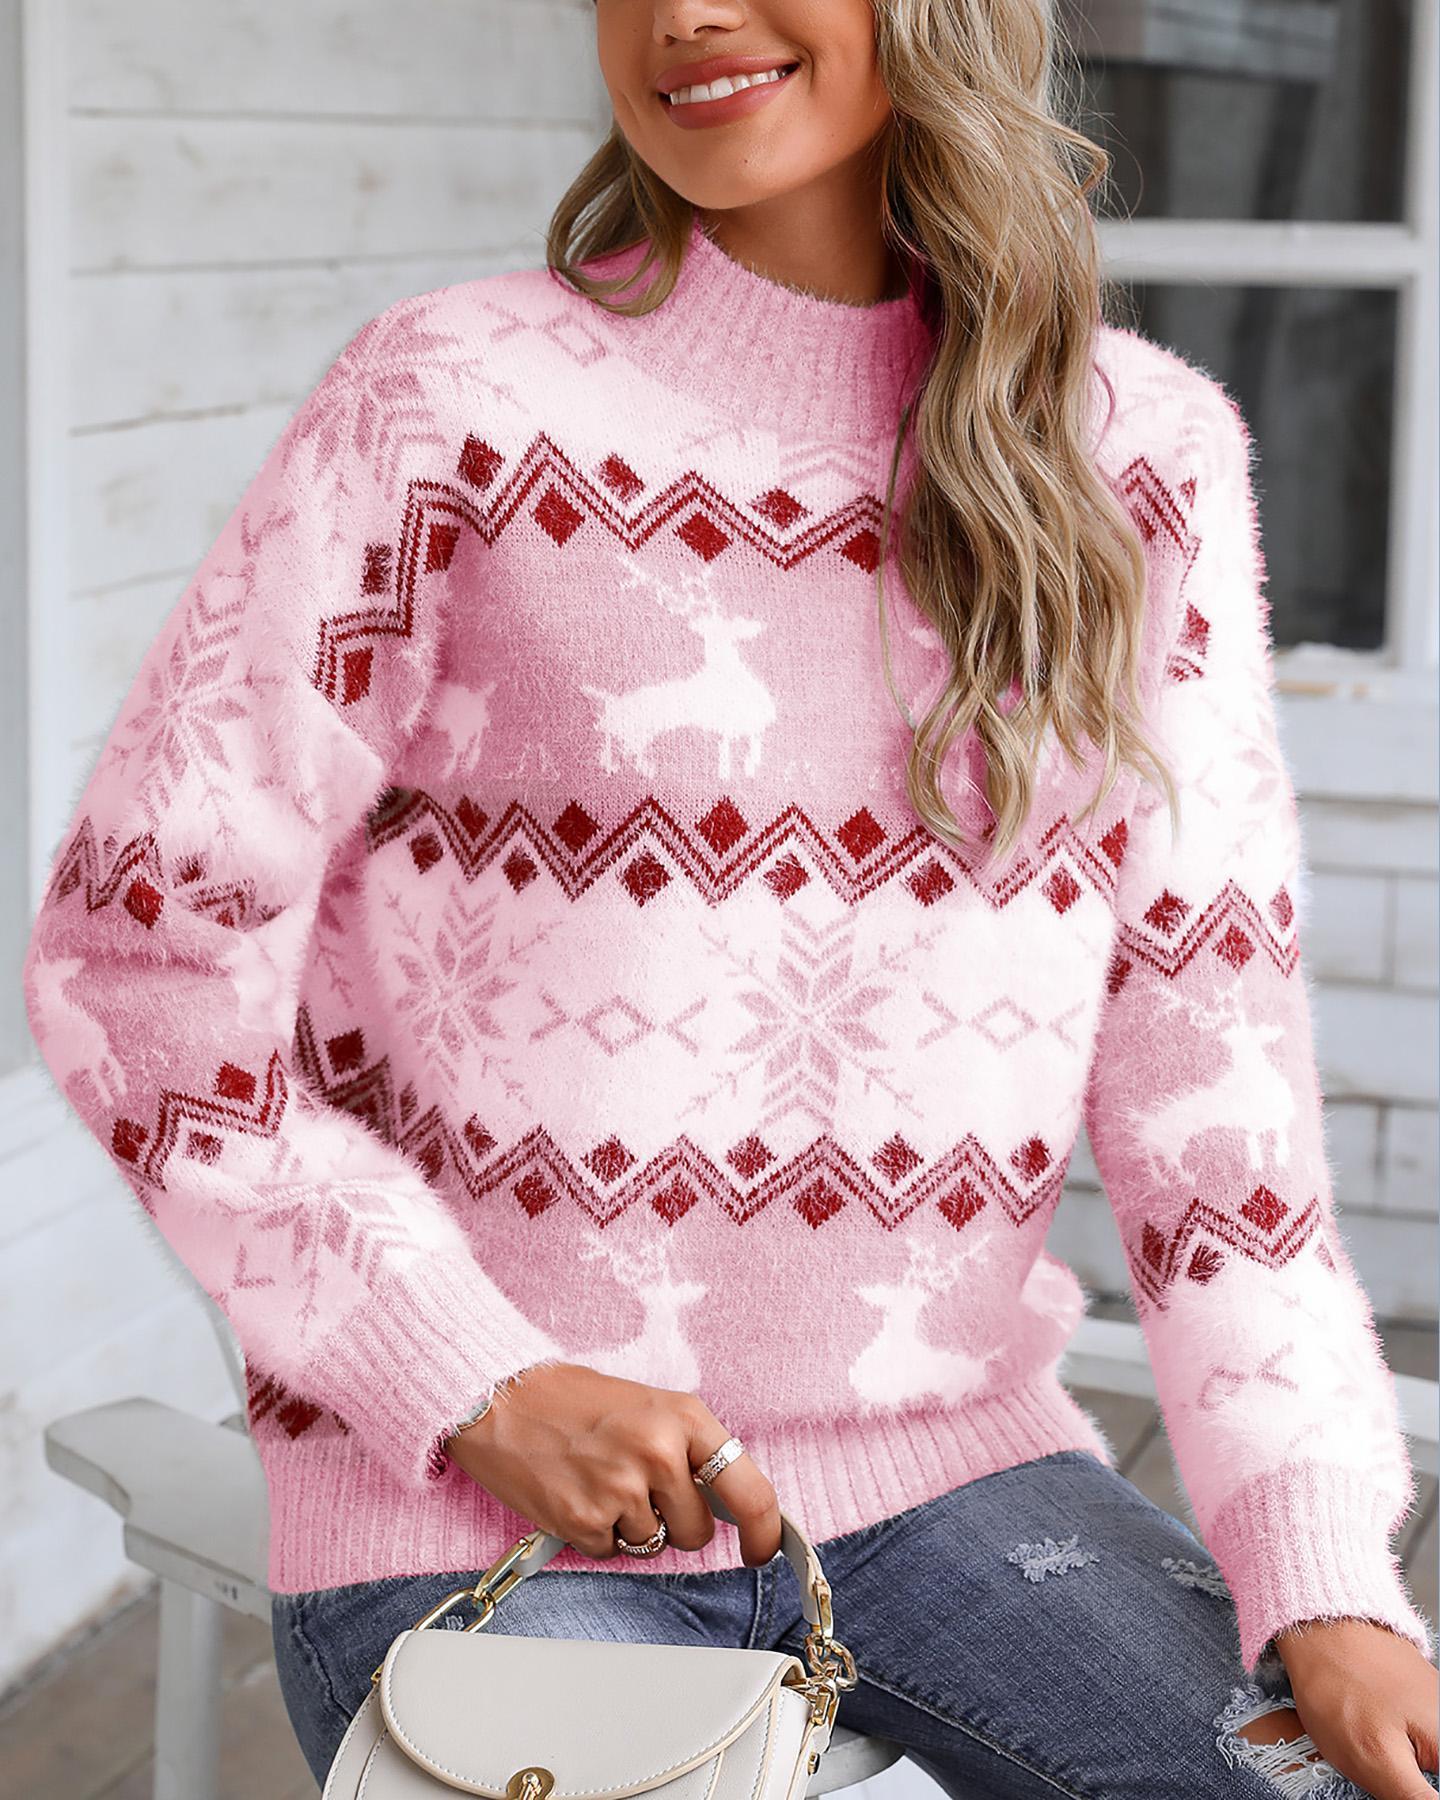 joyshoetique / Christmas Fluffy Reindeer Print Knit Ugly Sweater